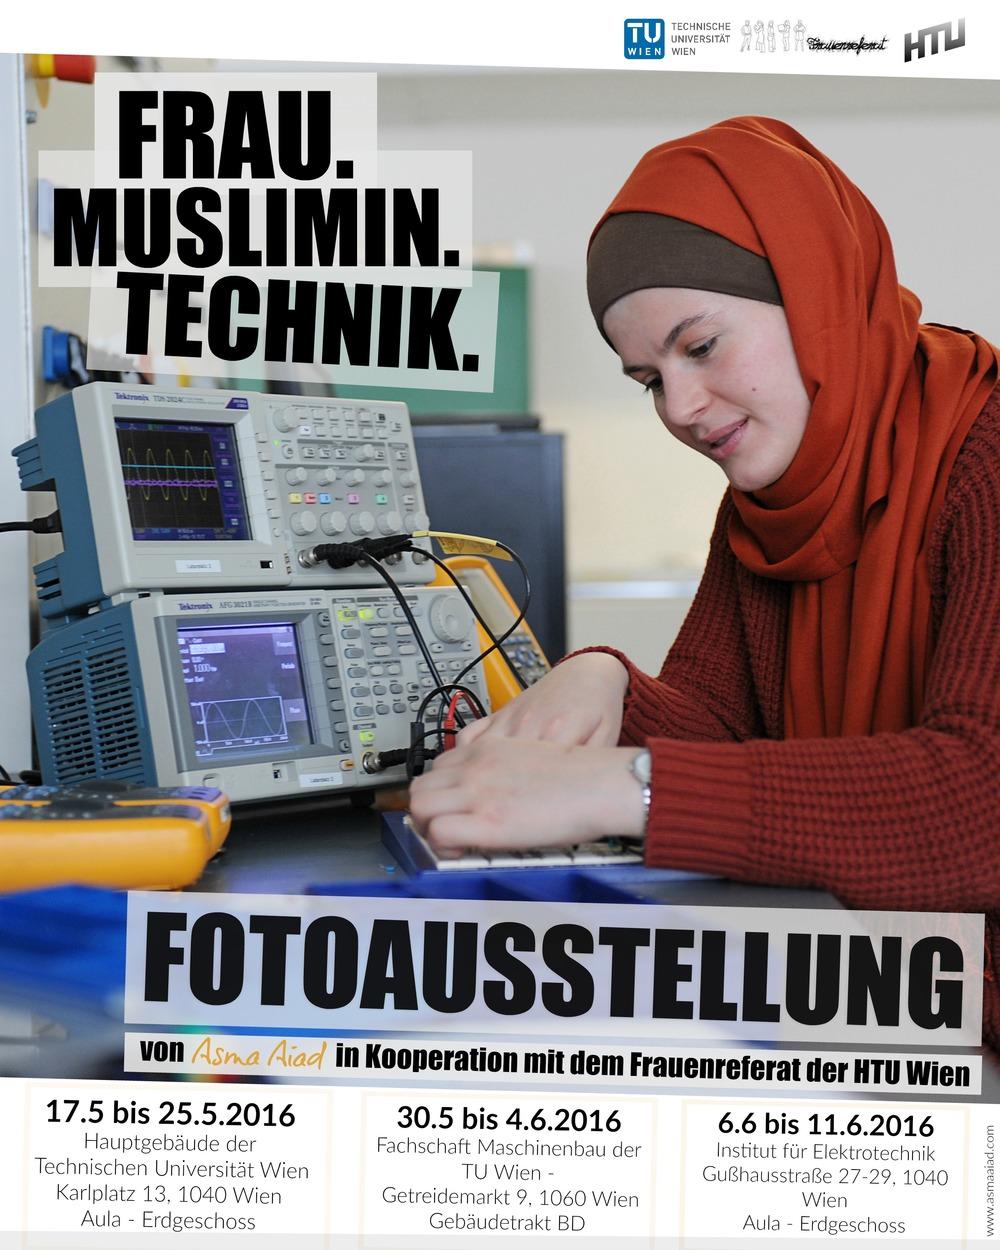 Fotoausstellung_FrauenTechnik.jpg